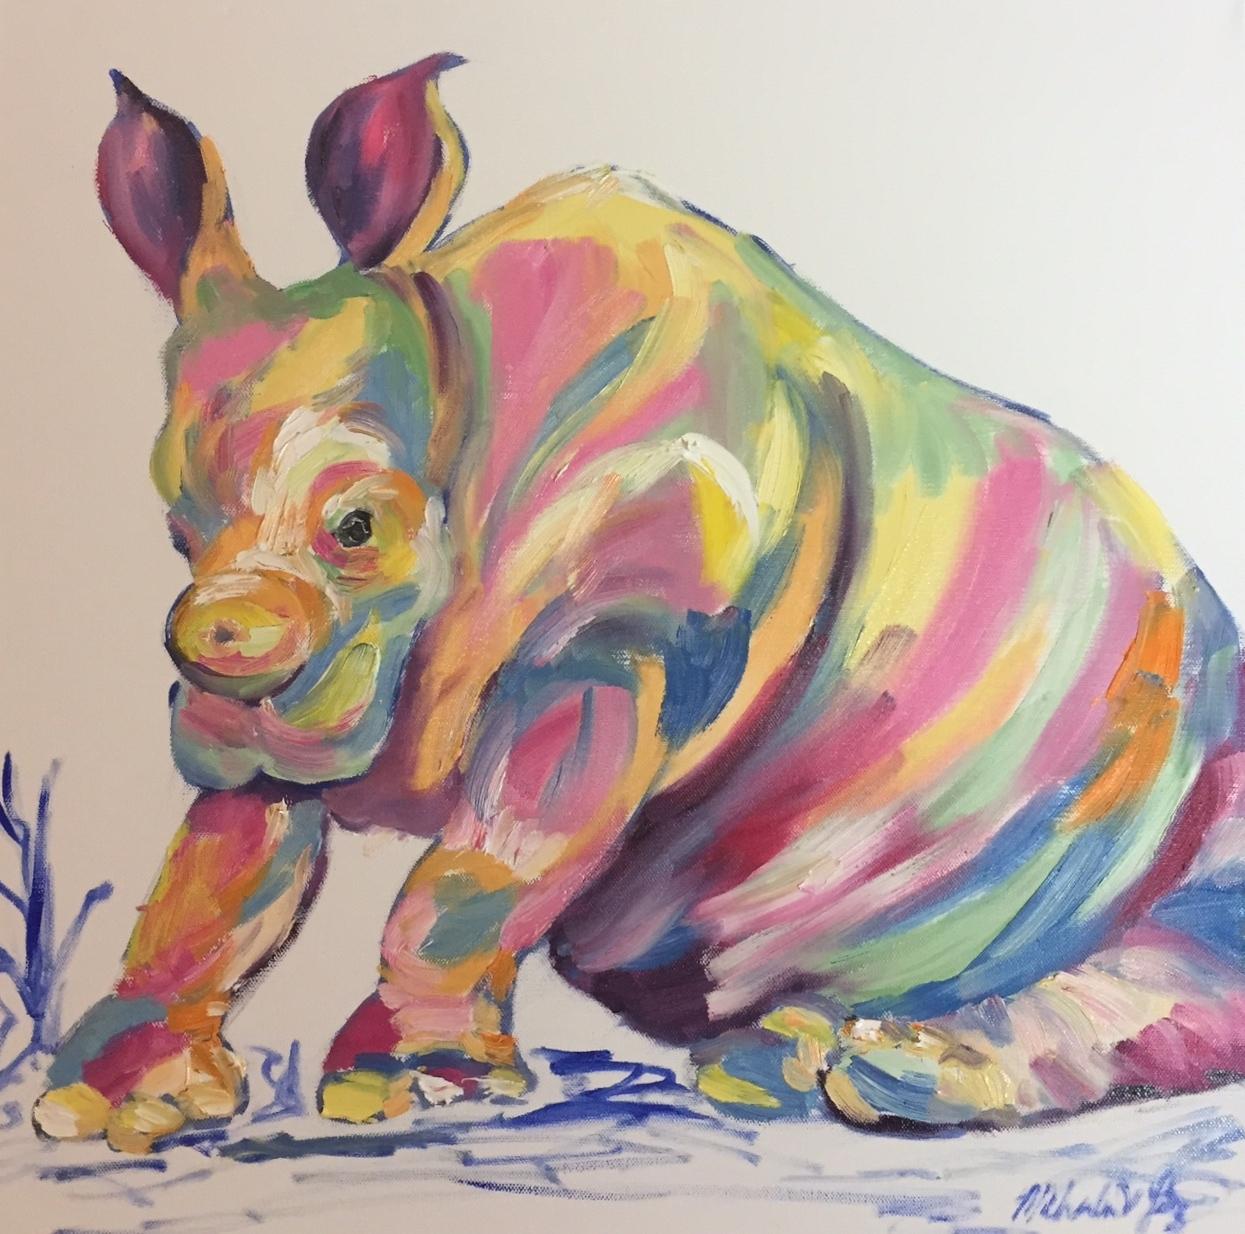 Brayden's Rhino